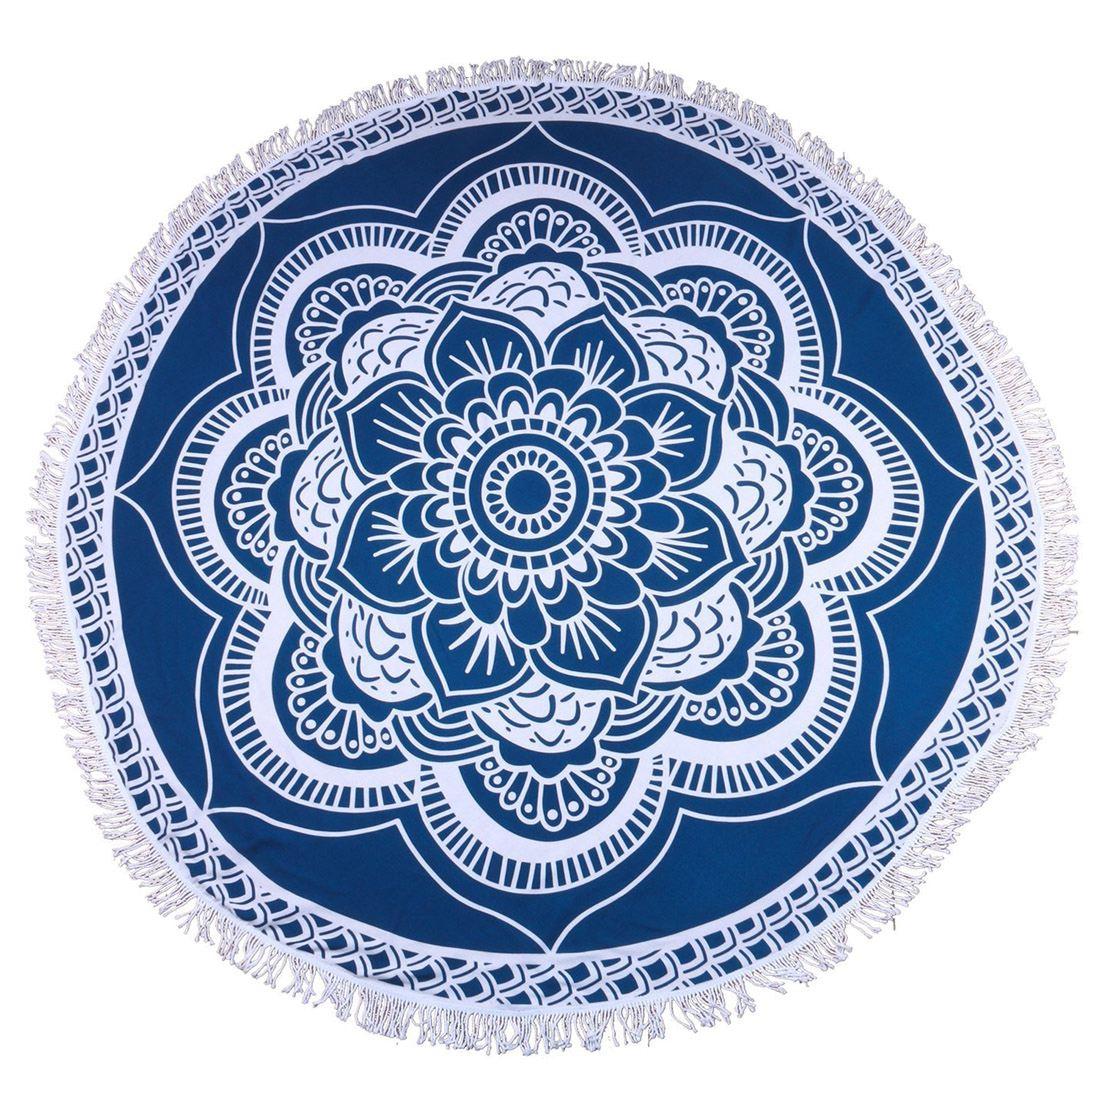 <+>  Мандала Круглый Roundie Beach Одеяло Throw Кисточка Крупногабаритный Коврик для йоги Blue Lotus ✔